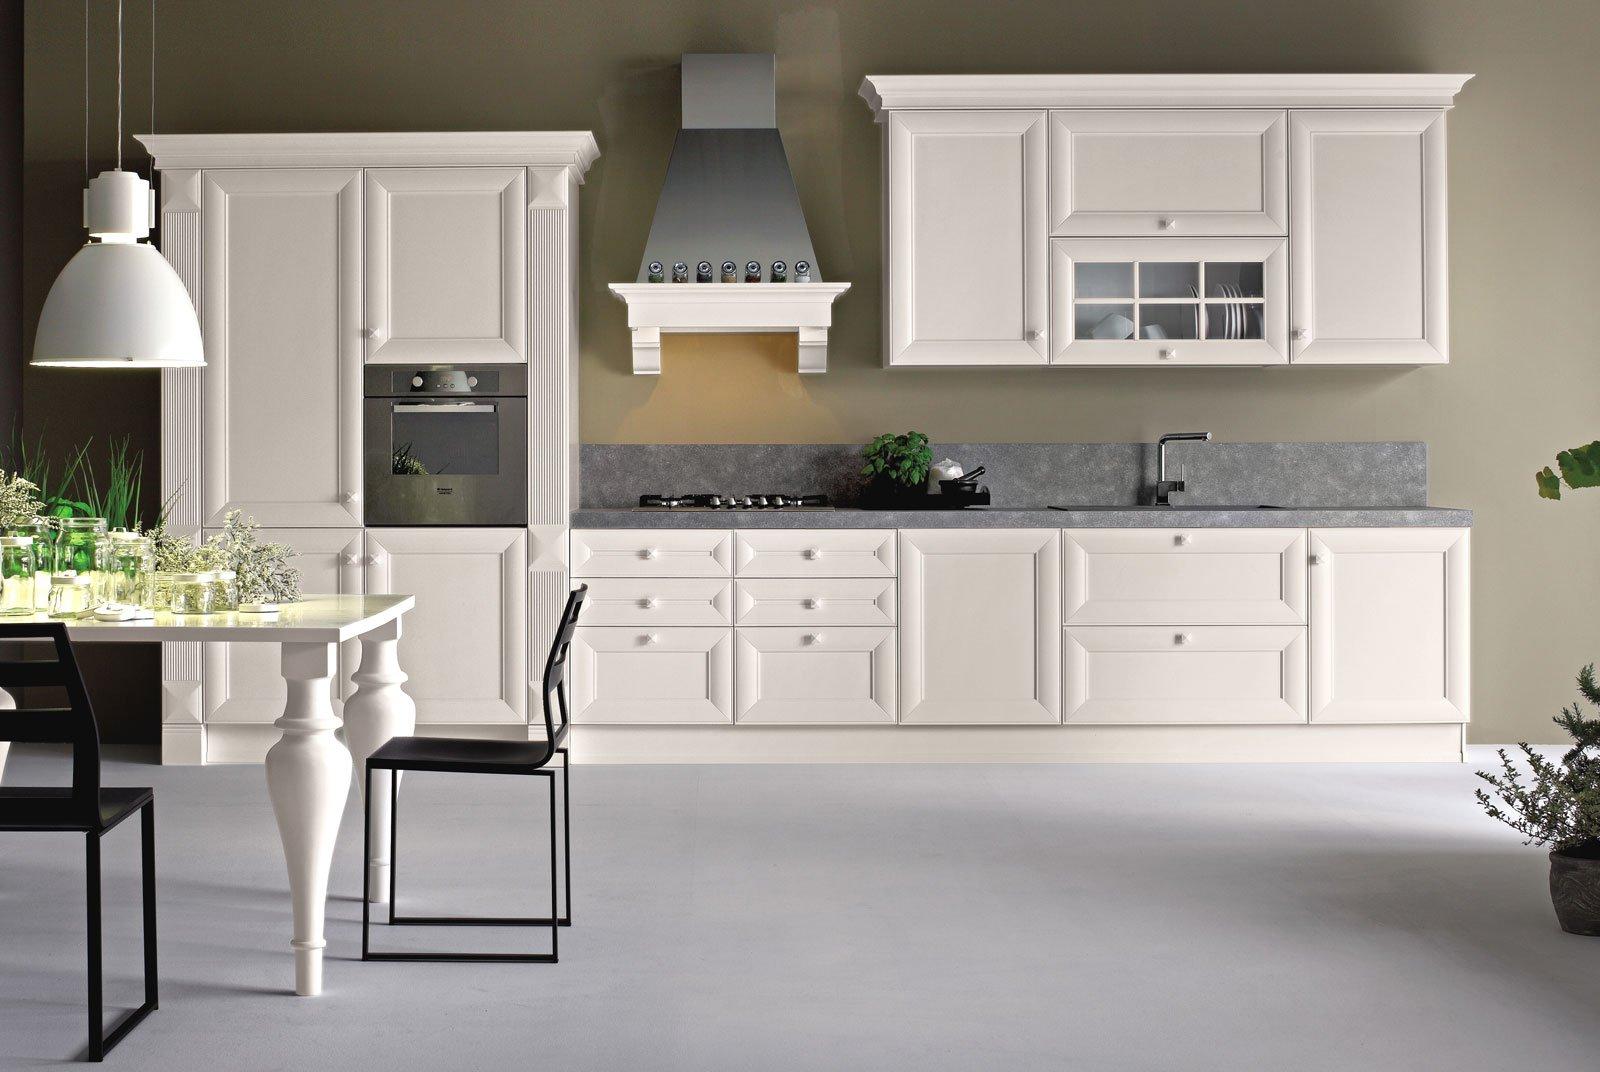 Cucina bianca il fascino eterno della luminosit cose di casa - Cucina rossa e bianca ...